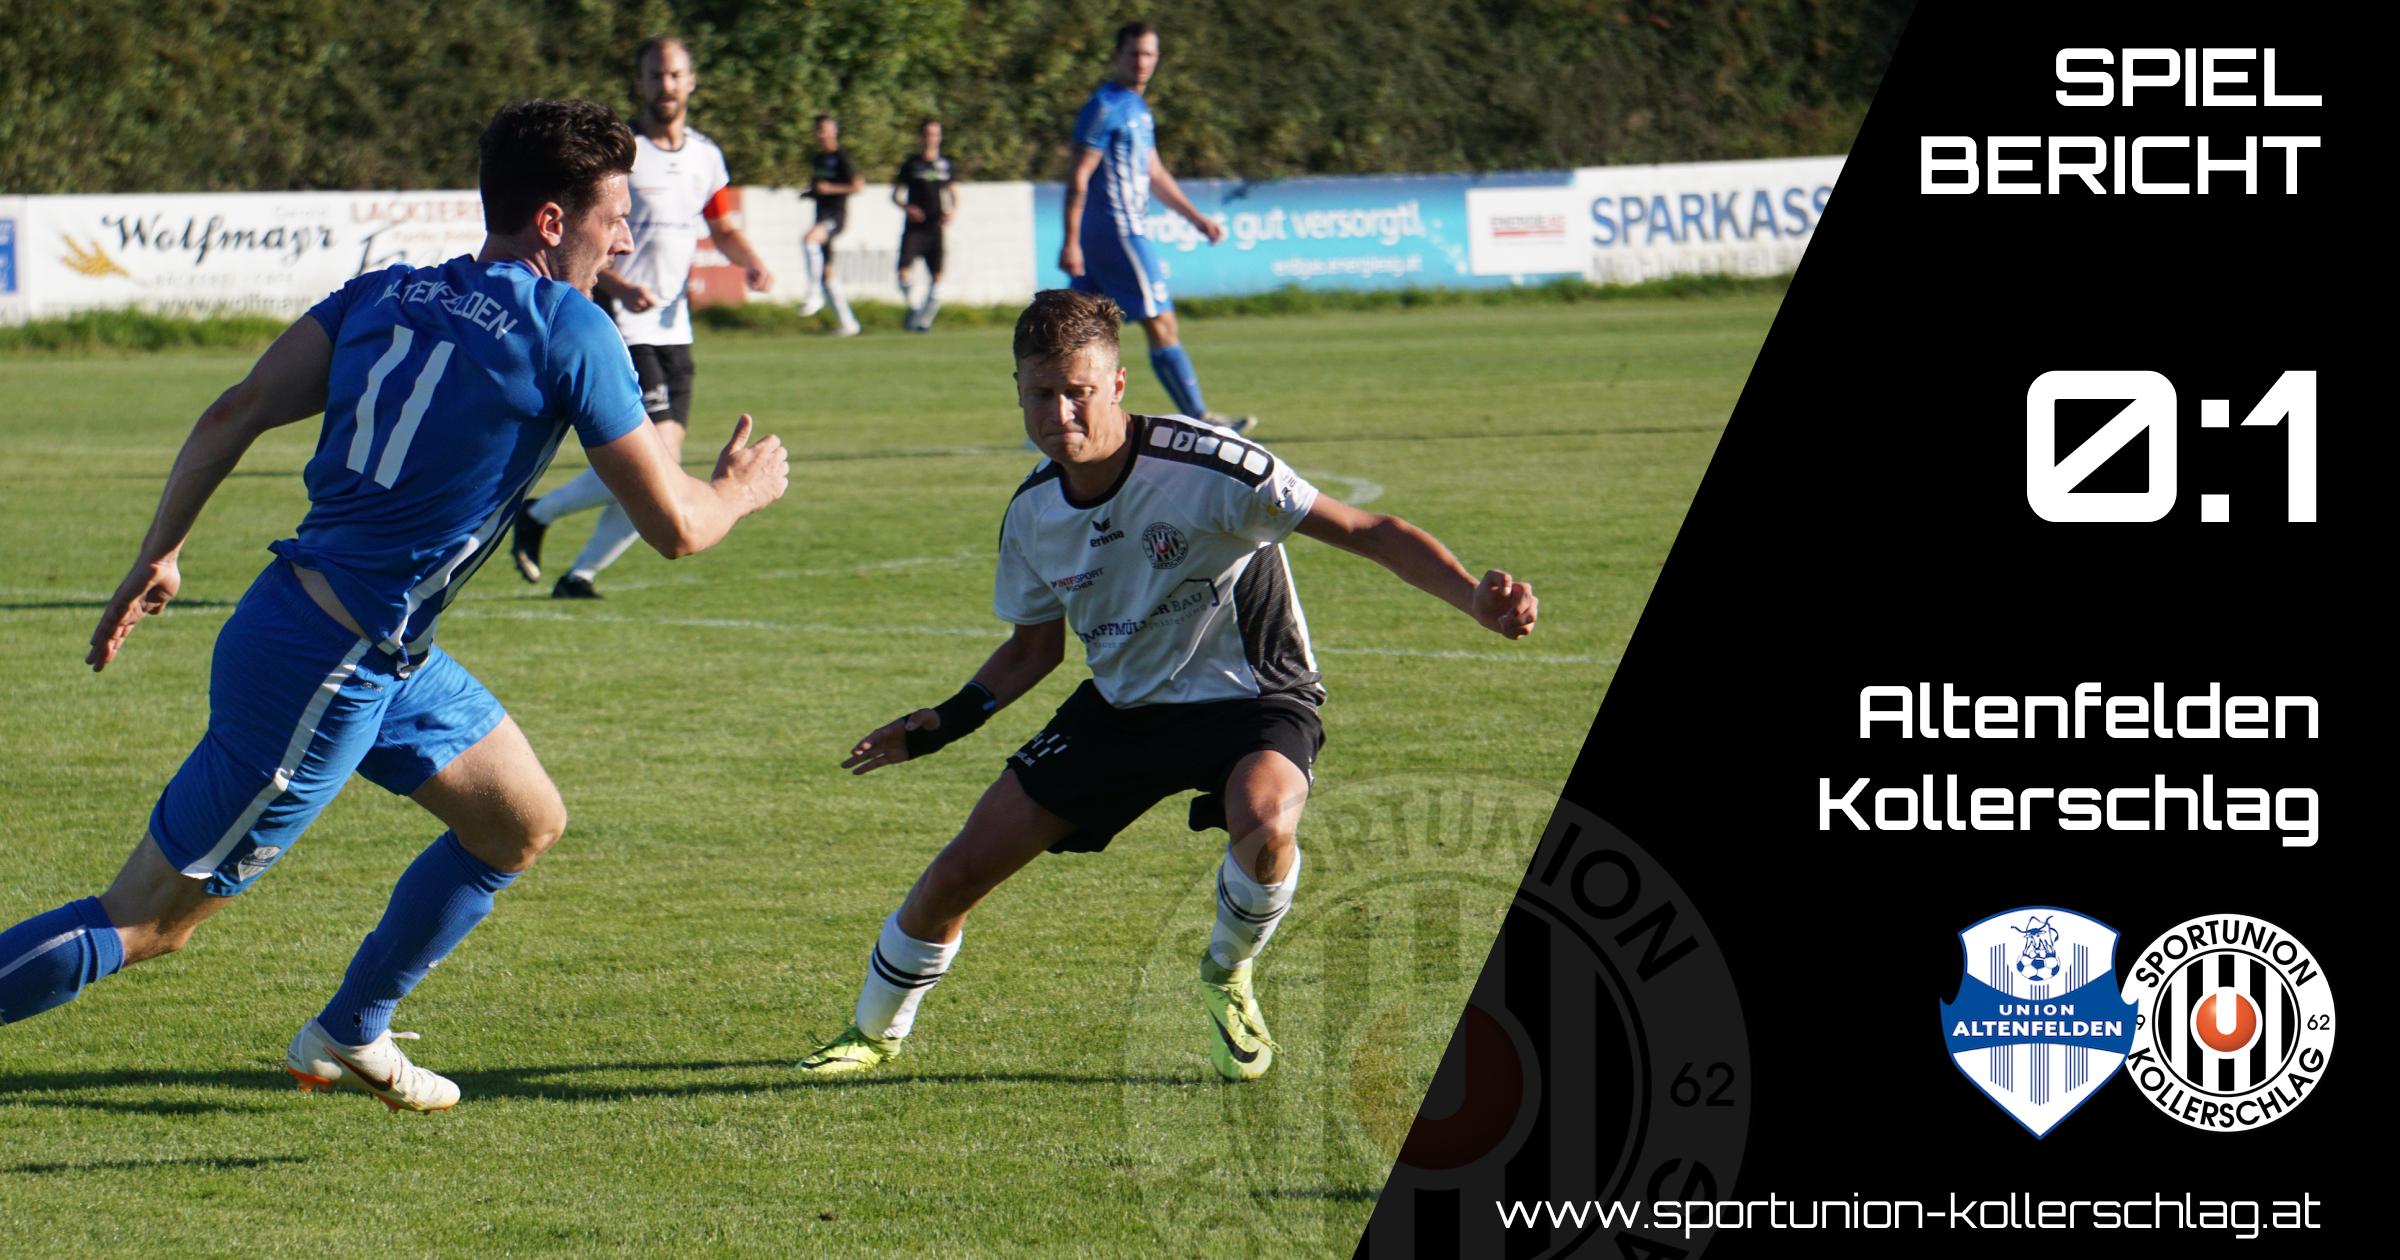 Goldtorschütze Manuel Ecker sichert unserer Mannschaft 3 wichtige Punkte in Altenfelden